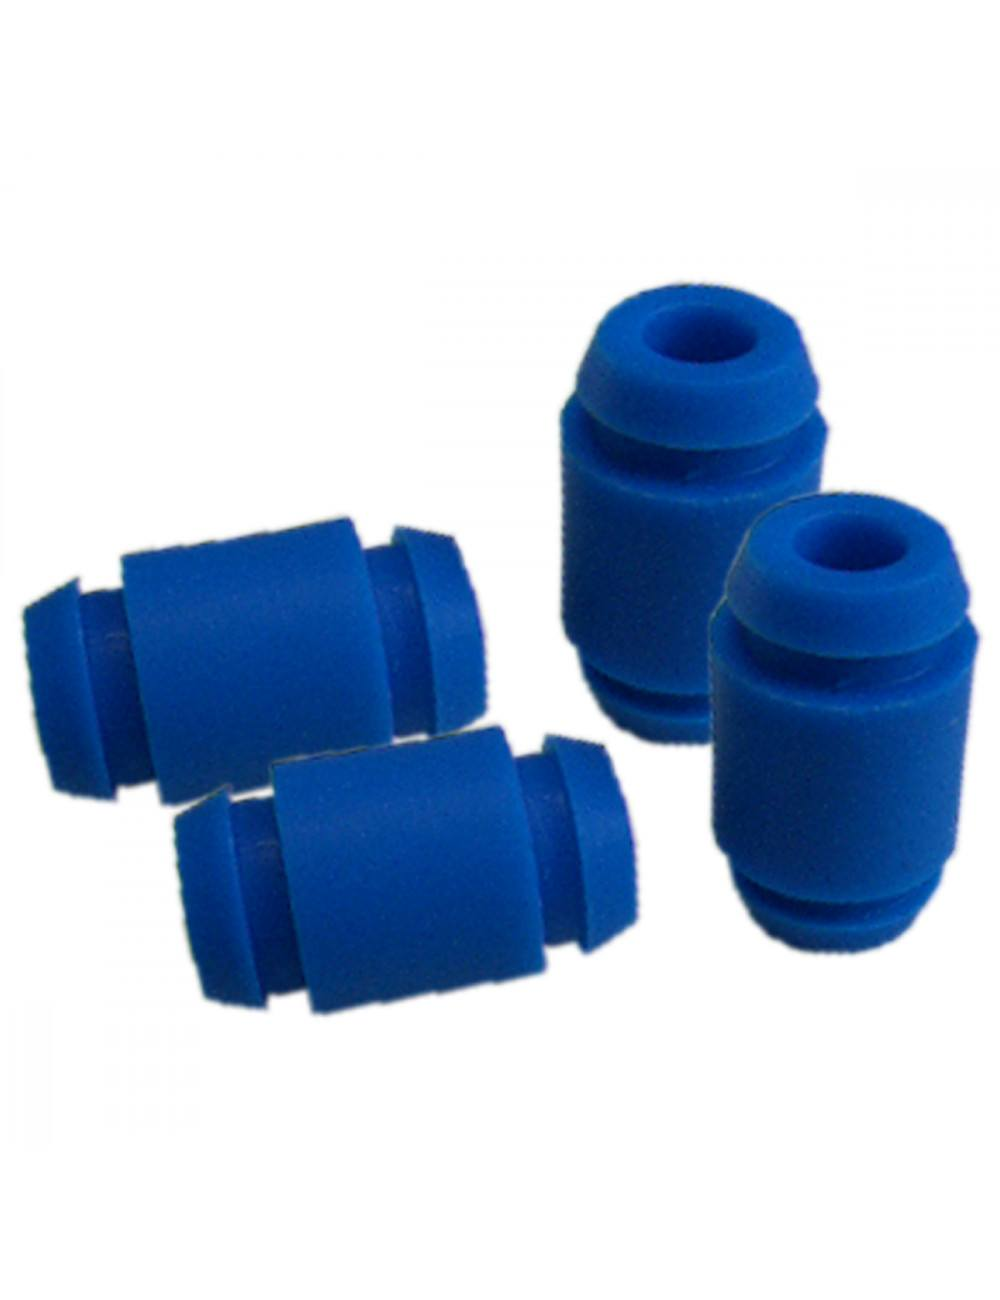 TUNZE - Silentbloc silicone 19 mm (x4) - ref : 6065.620